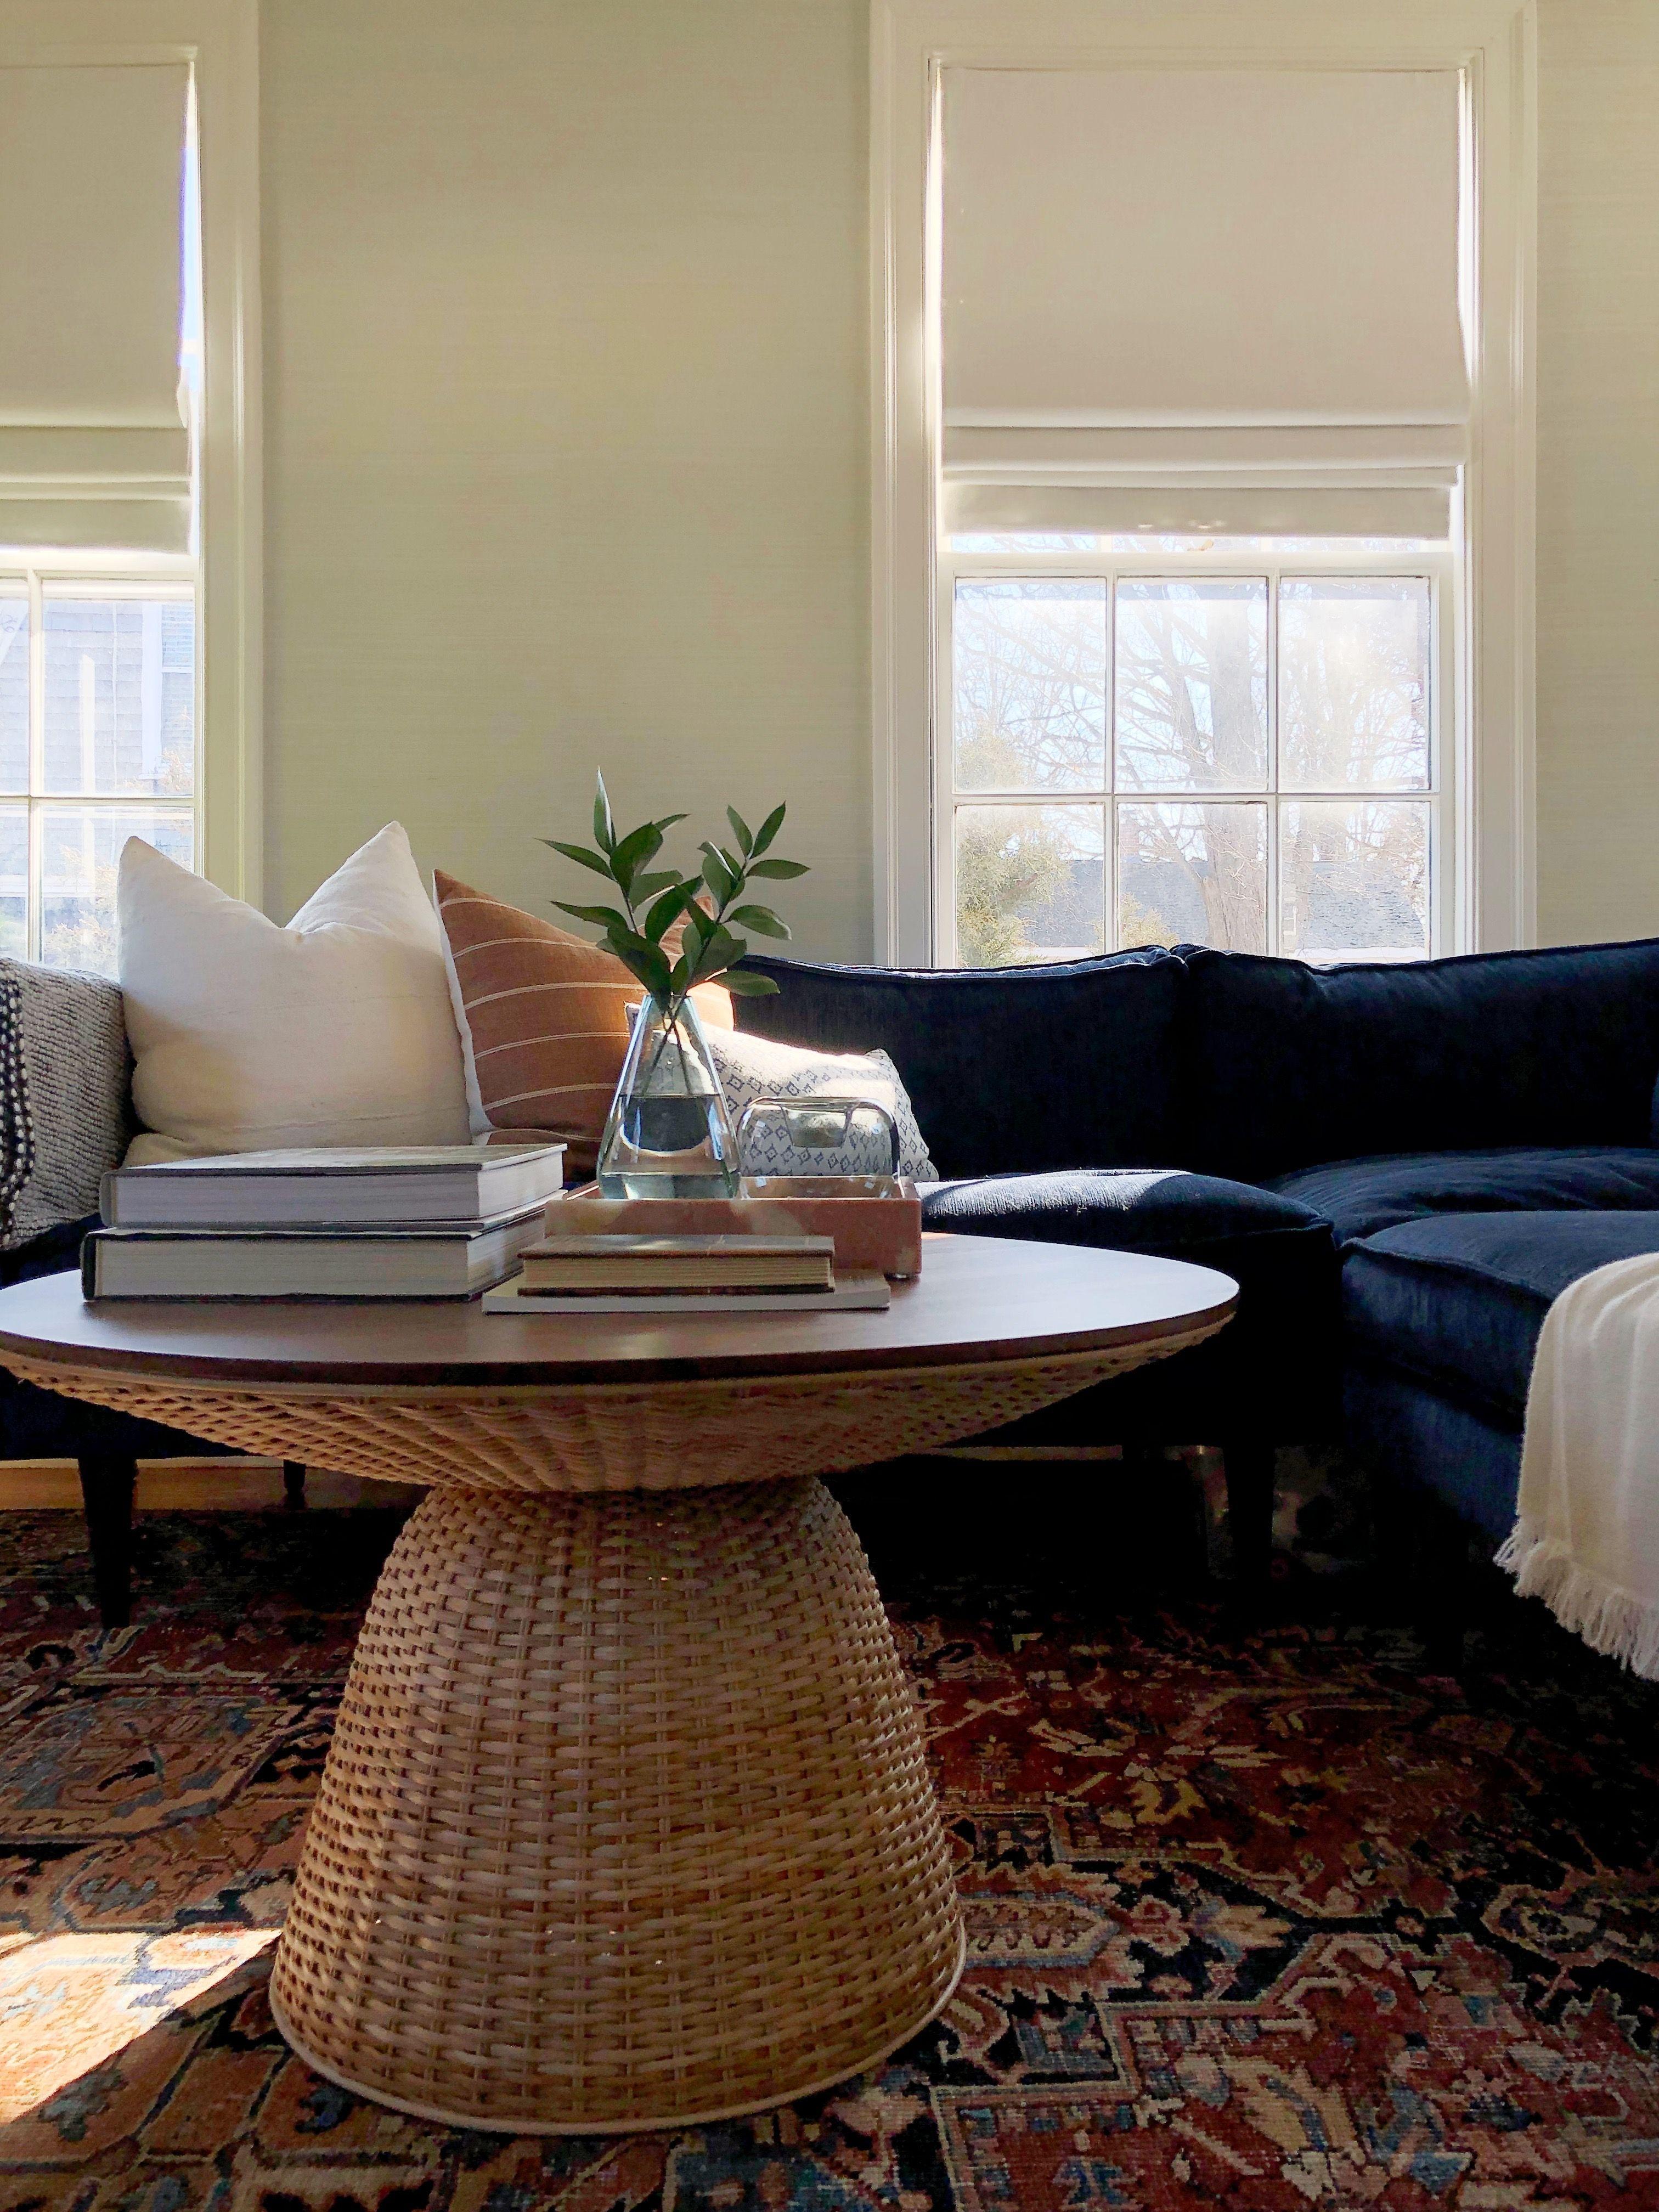 Organic Modern Living Room Trim Design Co In 2020 Oriental Living Room Furniture Coastal Decorating Living Room Rugs In Living Room #redecorating #the #living #room